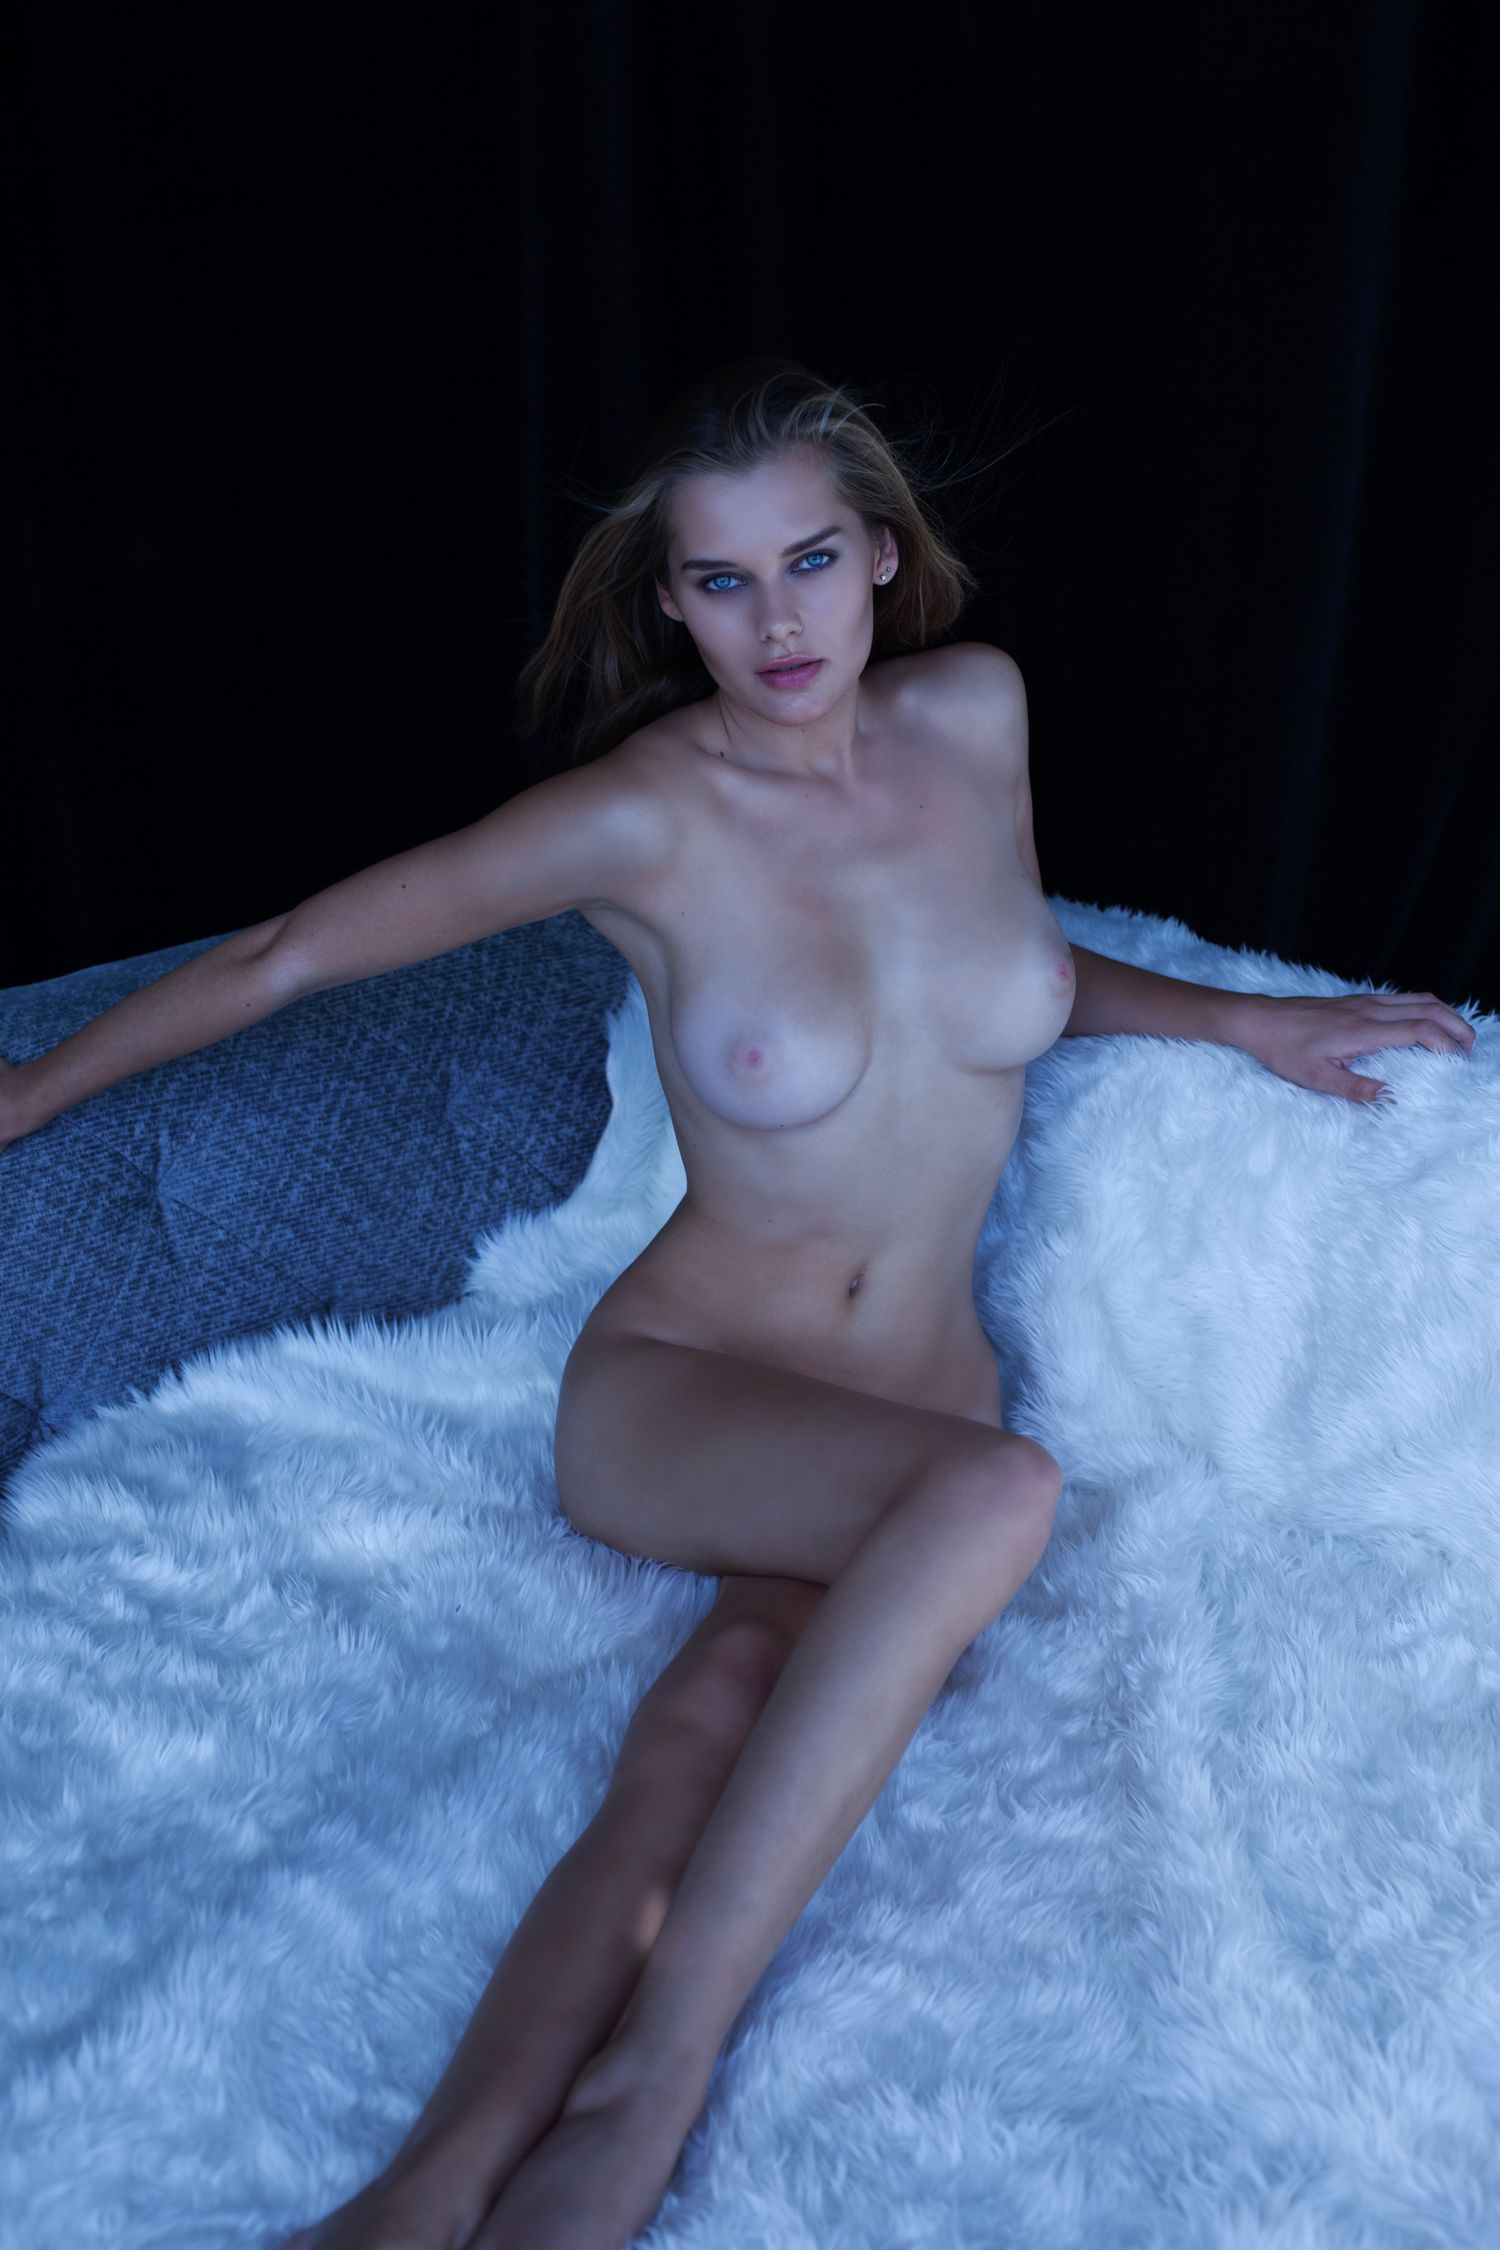 Solveig mork hansen boobs